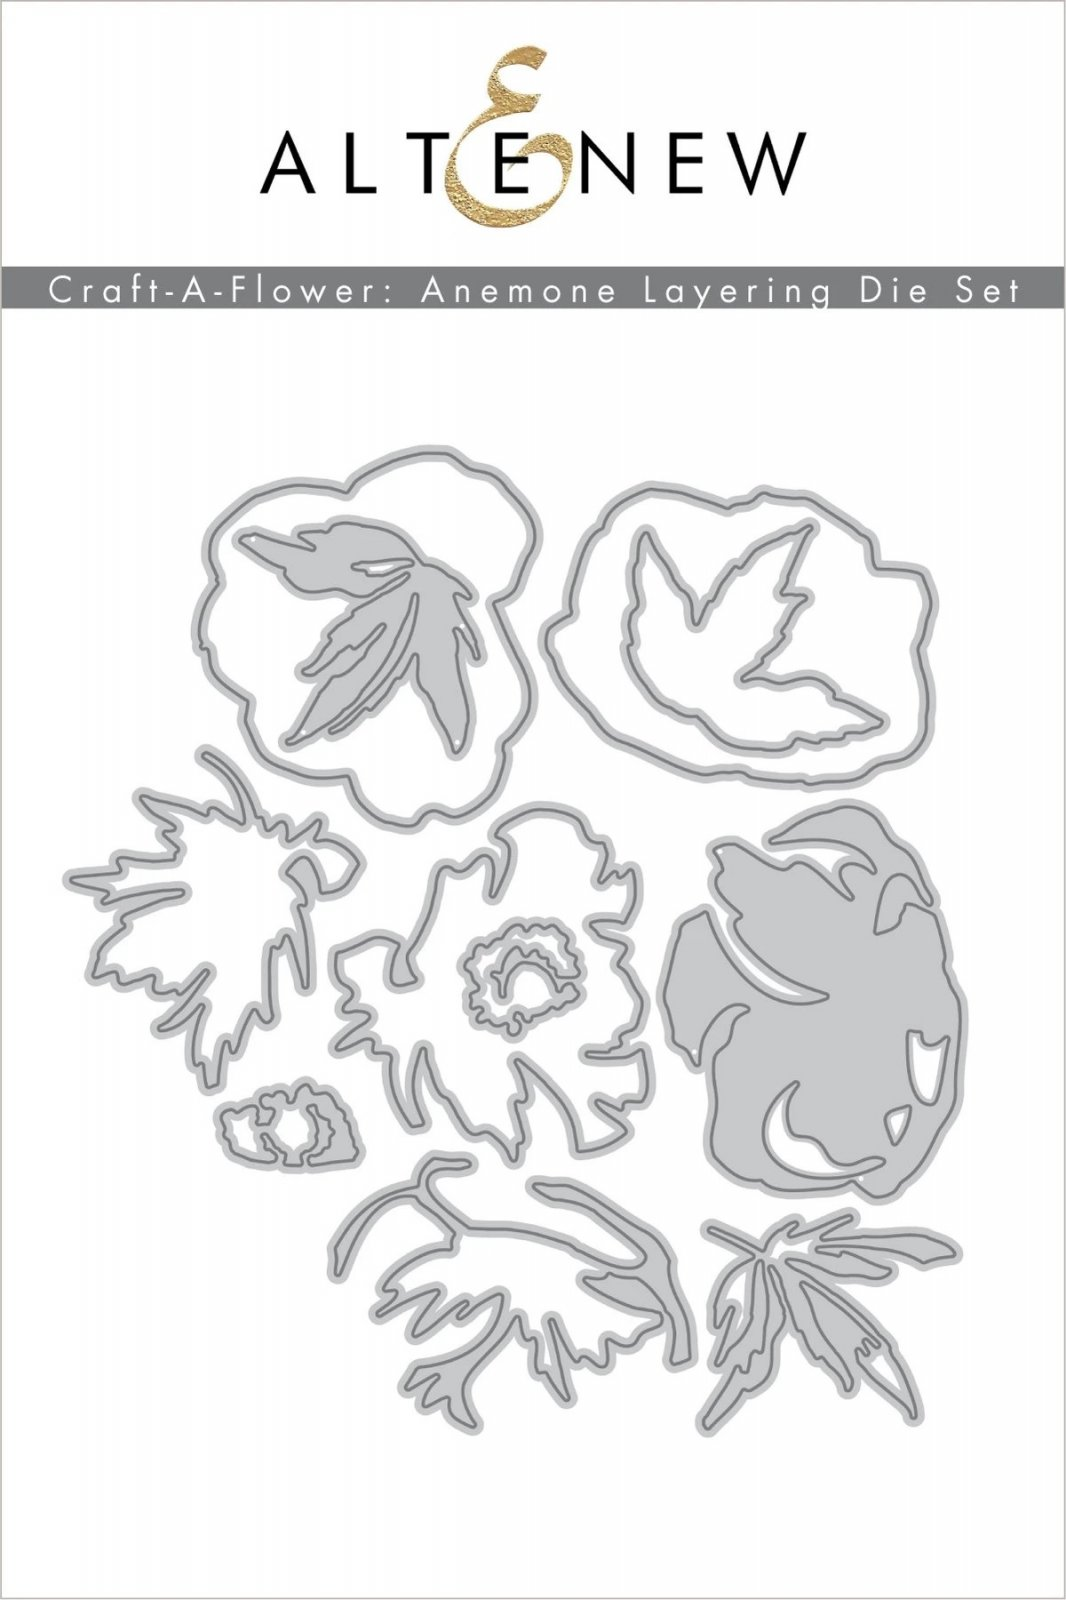 Craft-A-Flower Anemone